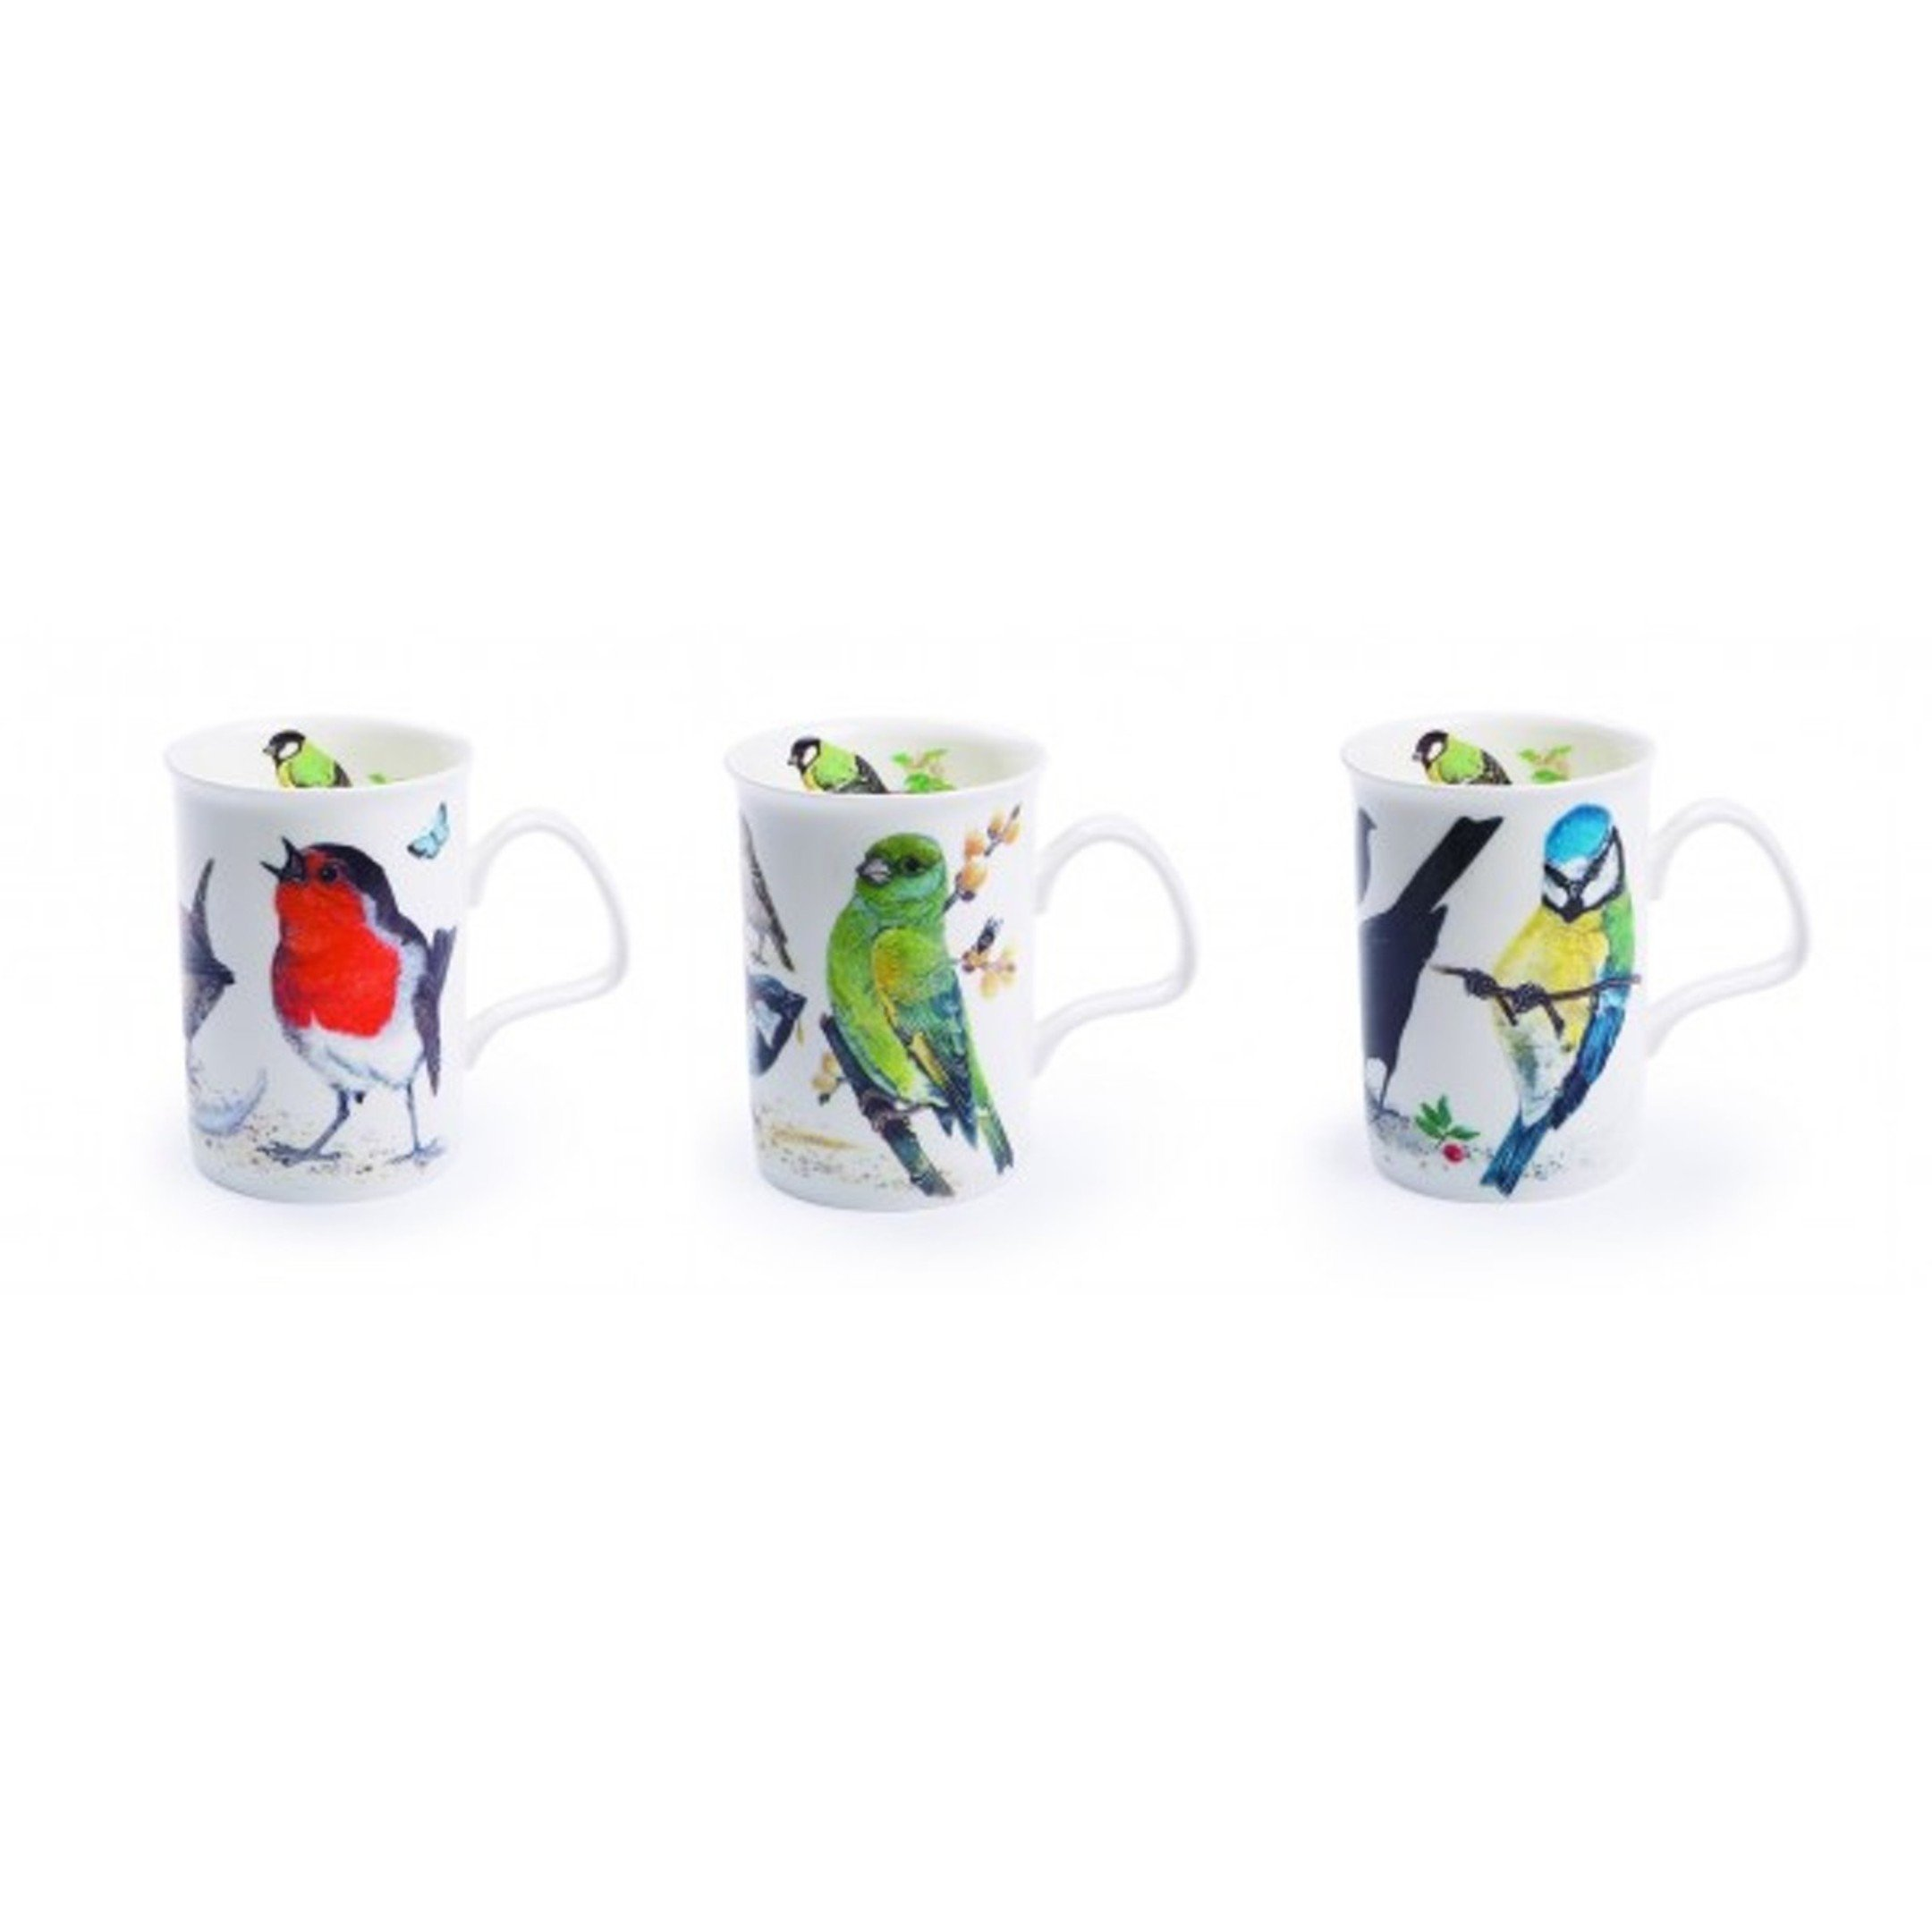 6 Piece Roy Kirkham Lancaster Mug Set Buy Online In Faroe Islands At Faroe Desertcart Com Productid 58706794